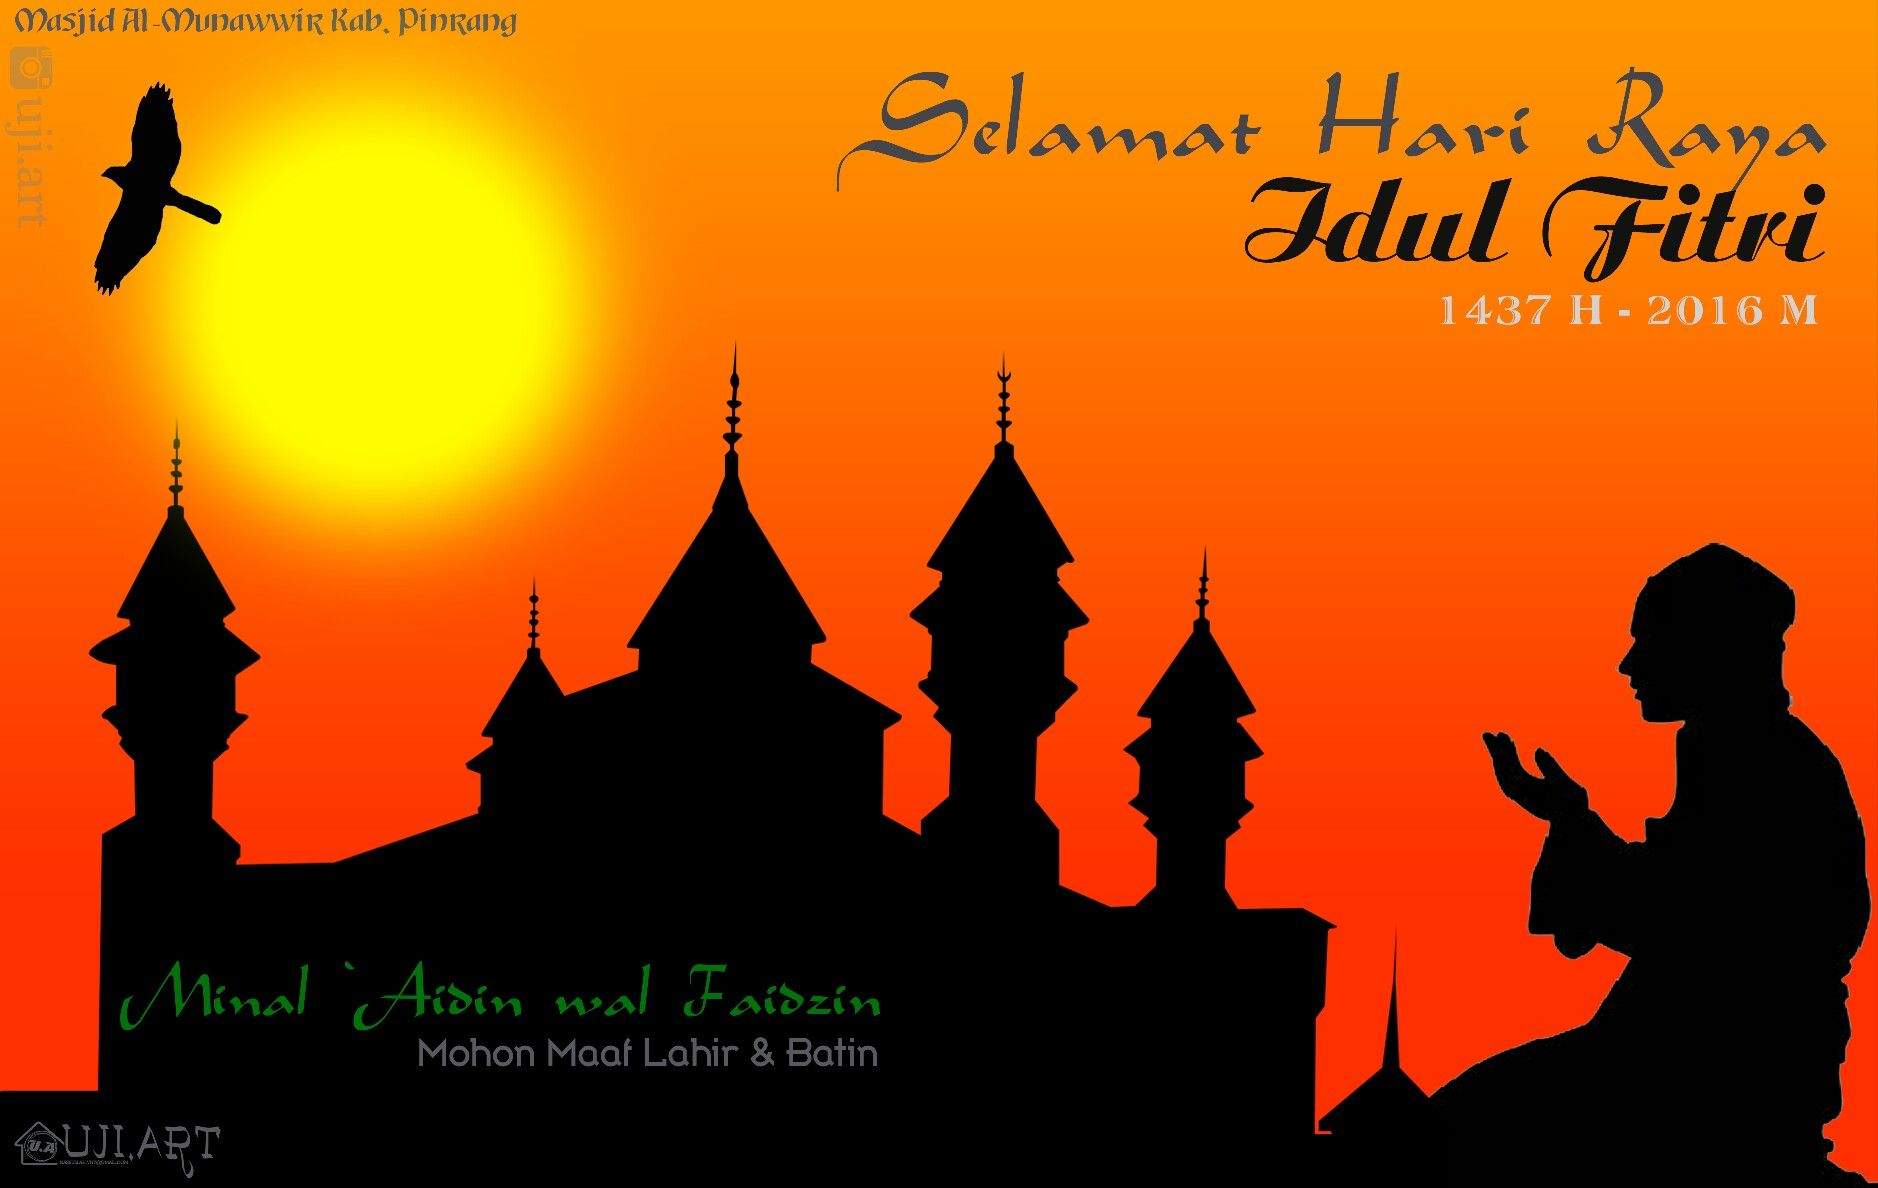 Selamat Hari Raya Idul Fitri 1437 H Minal Aidin Wal Faizin Mohon